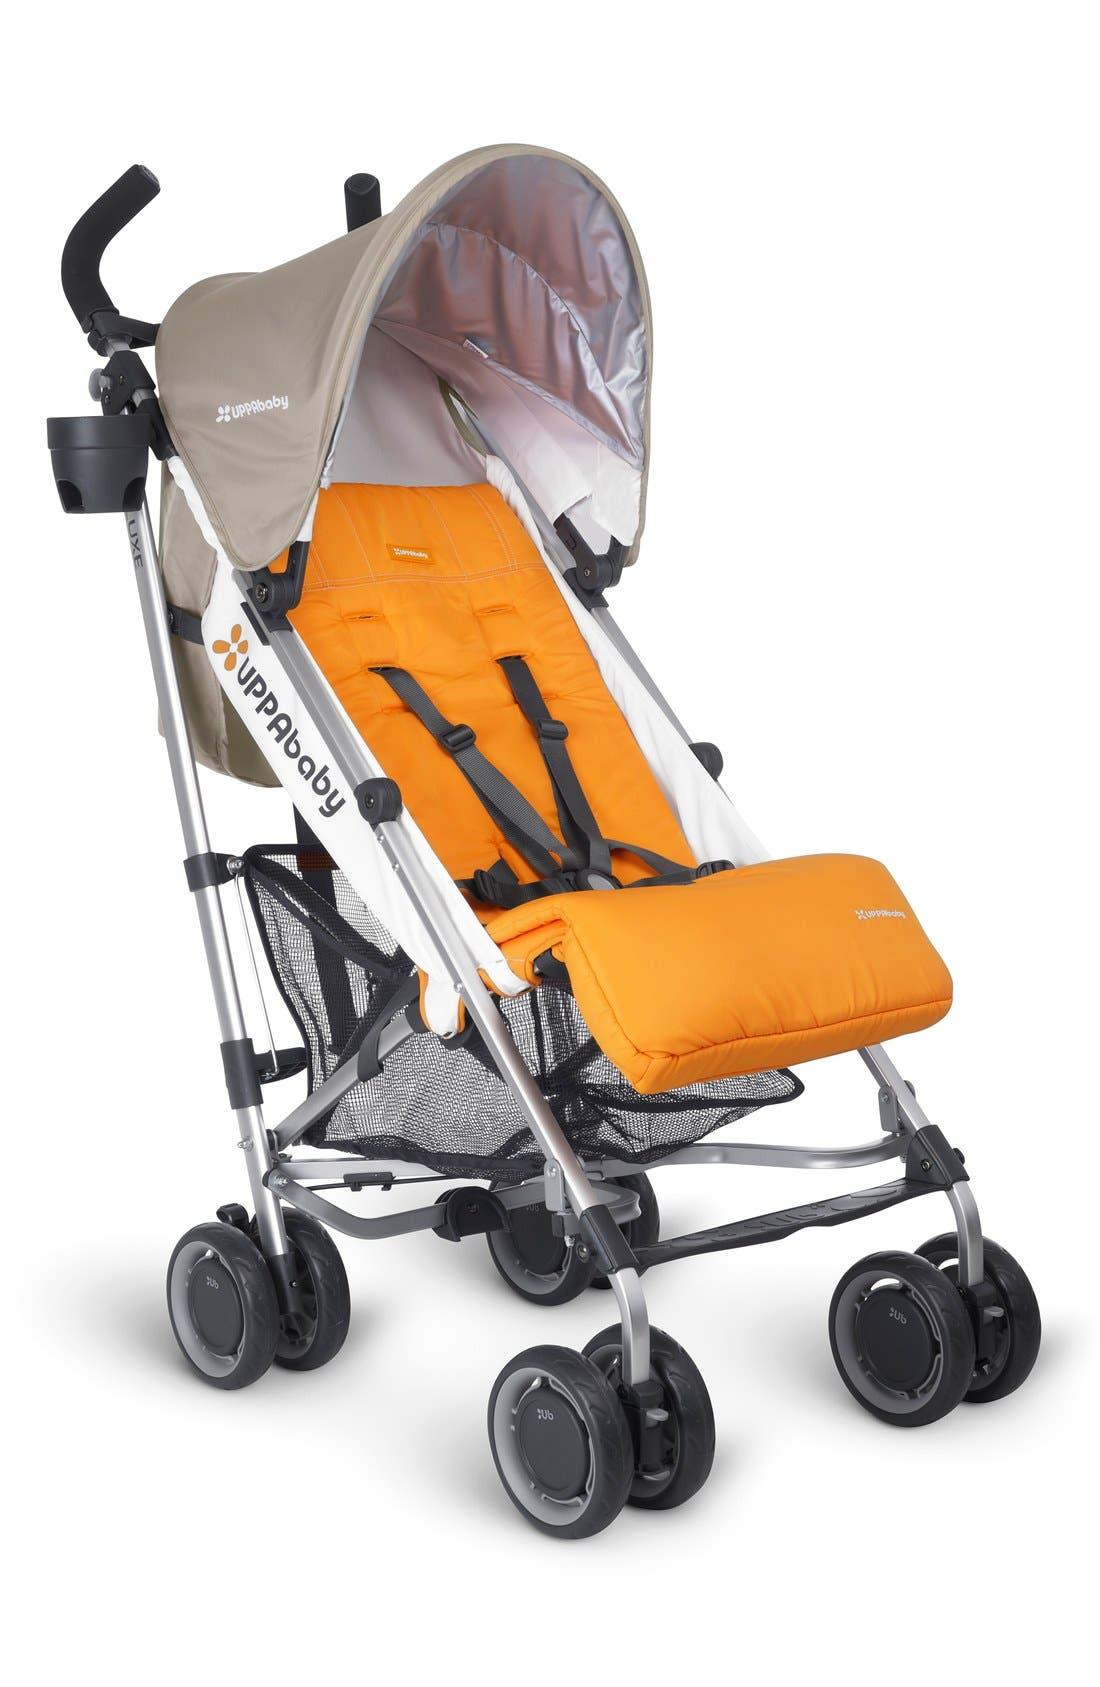 2015 G-LUXE - Aluminum Frame Reclining Umbrella Stroller,                             Main thumbnail 6, color,